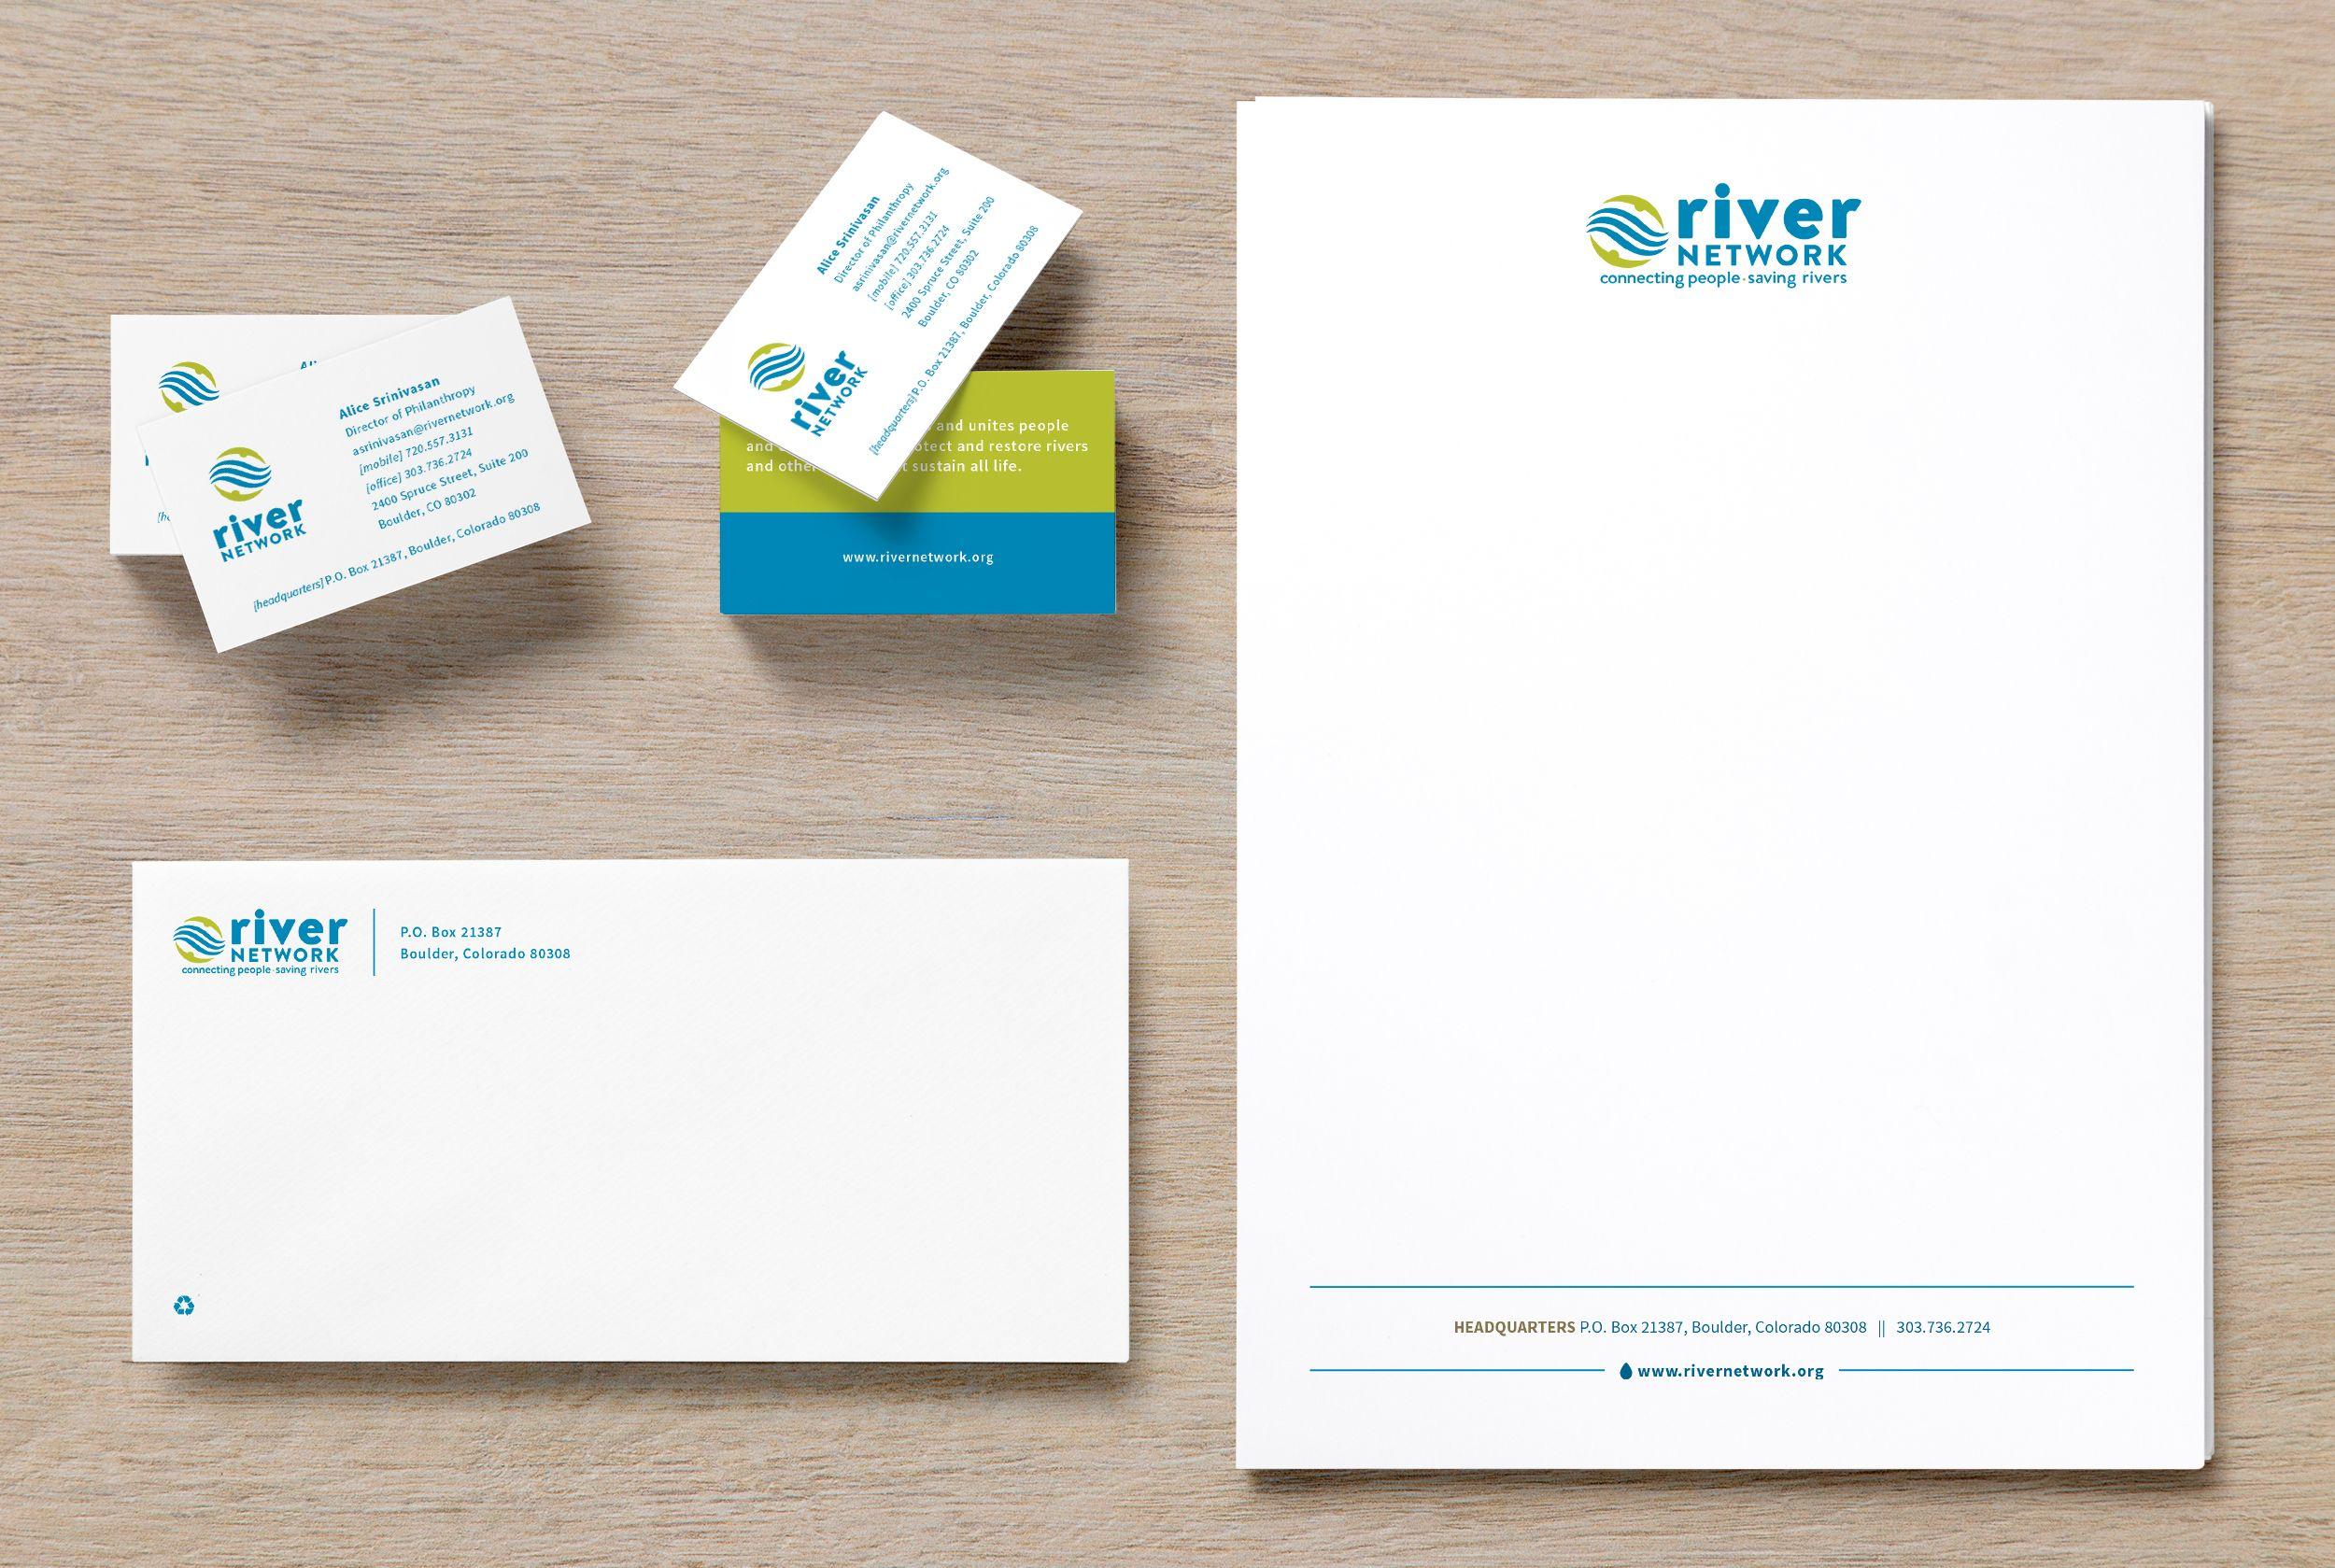 River Network Branding Suite Stationery Letterhead Business